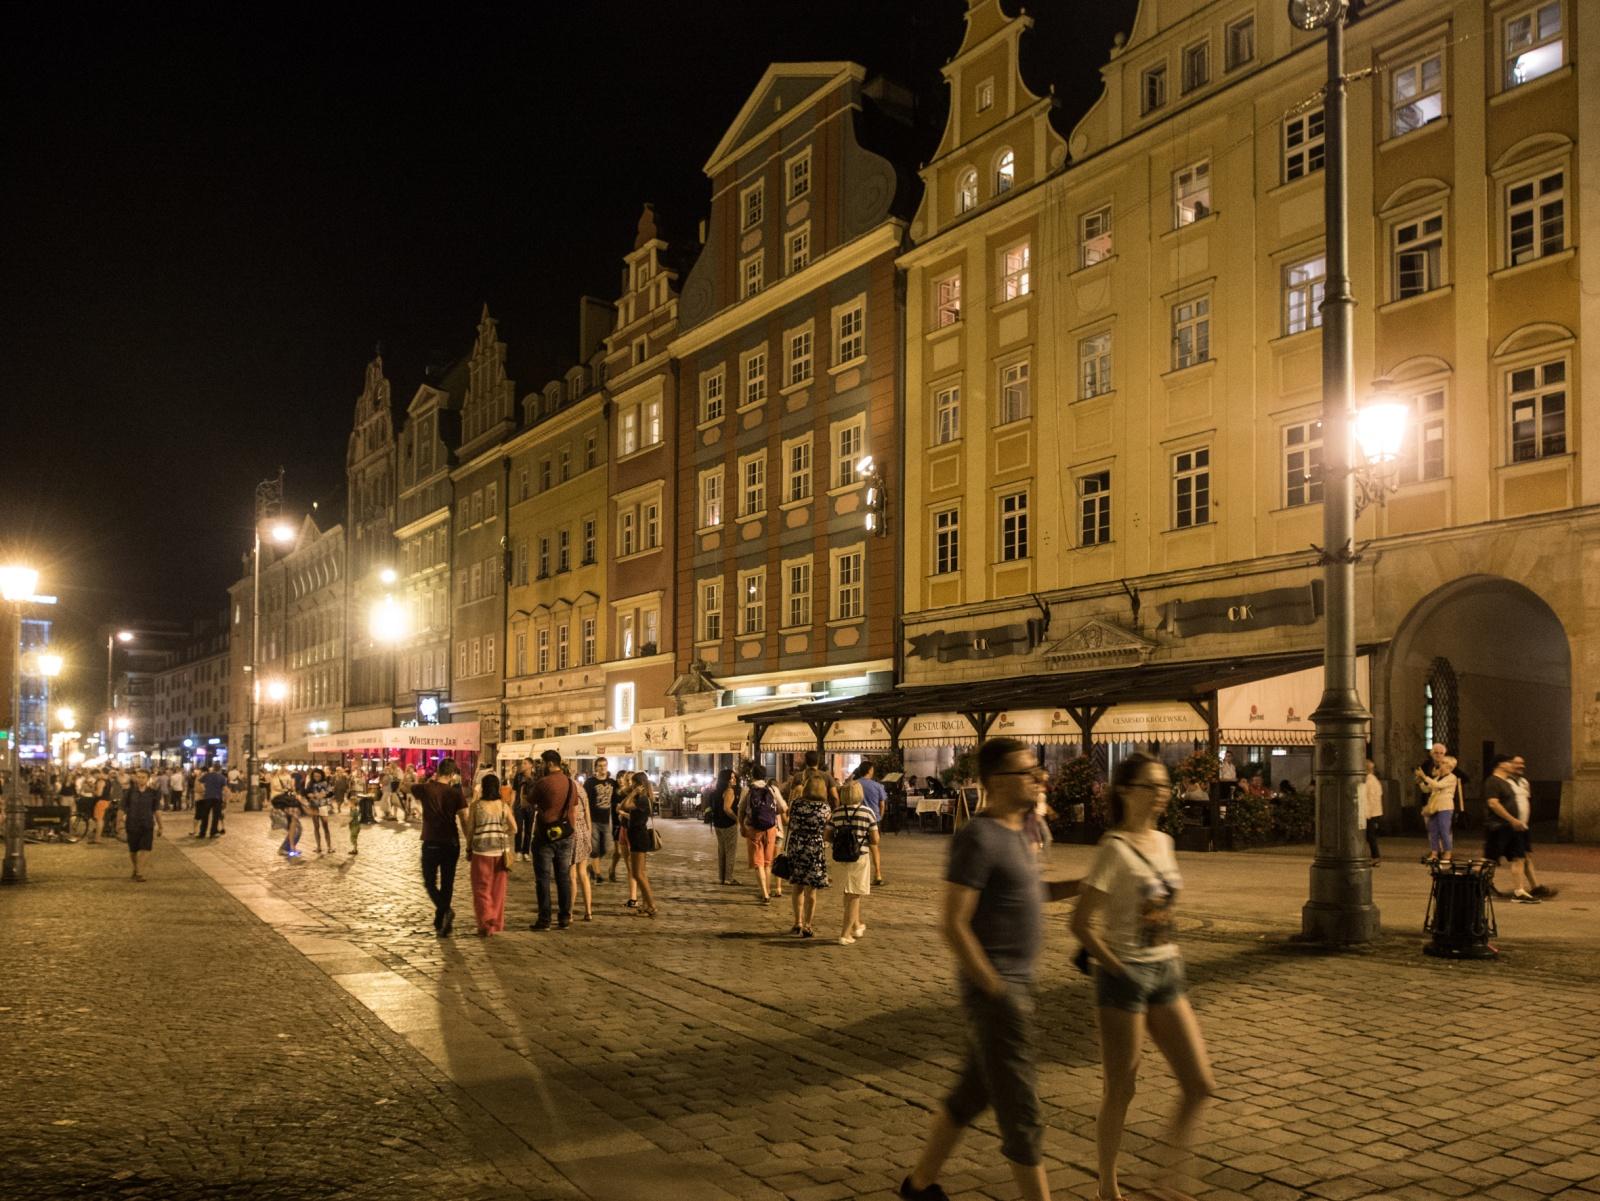 WROCLAW BY NIGHT, POLAND - AUGUST 2015